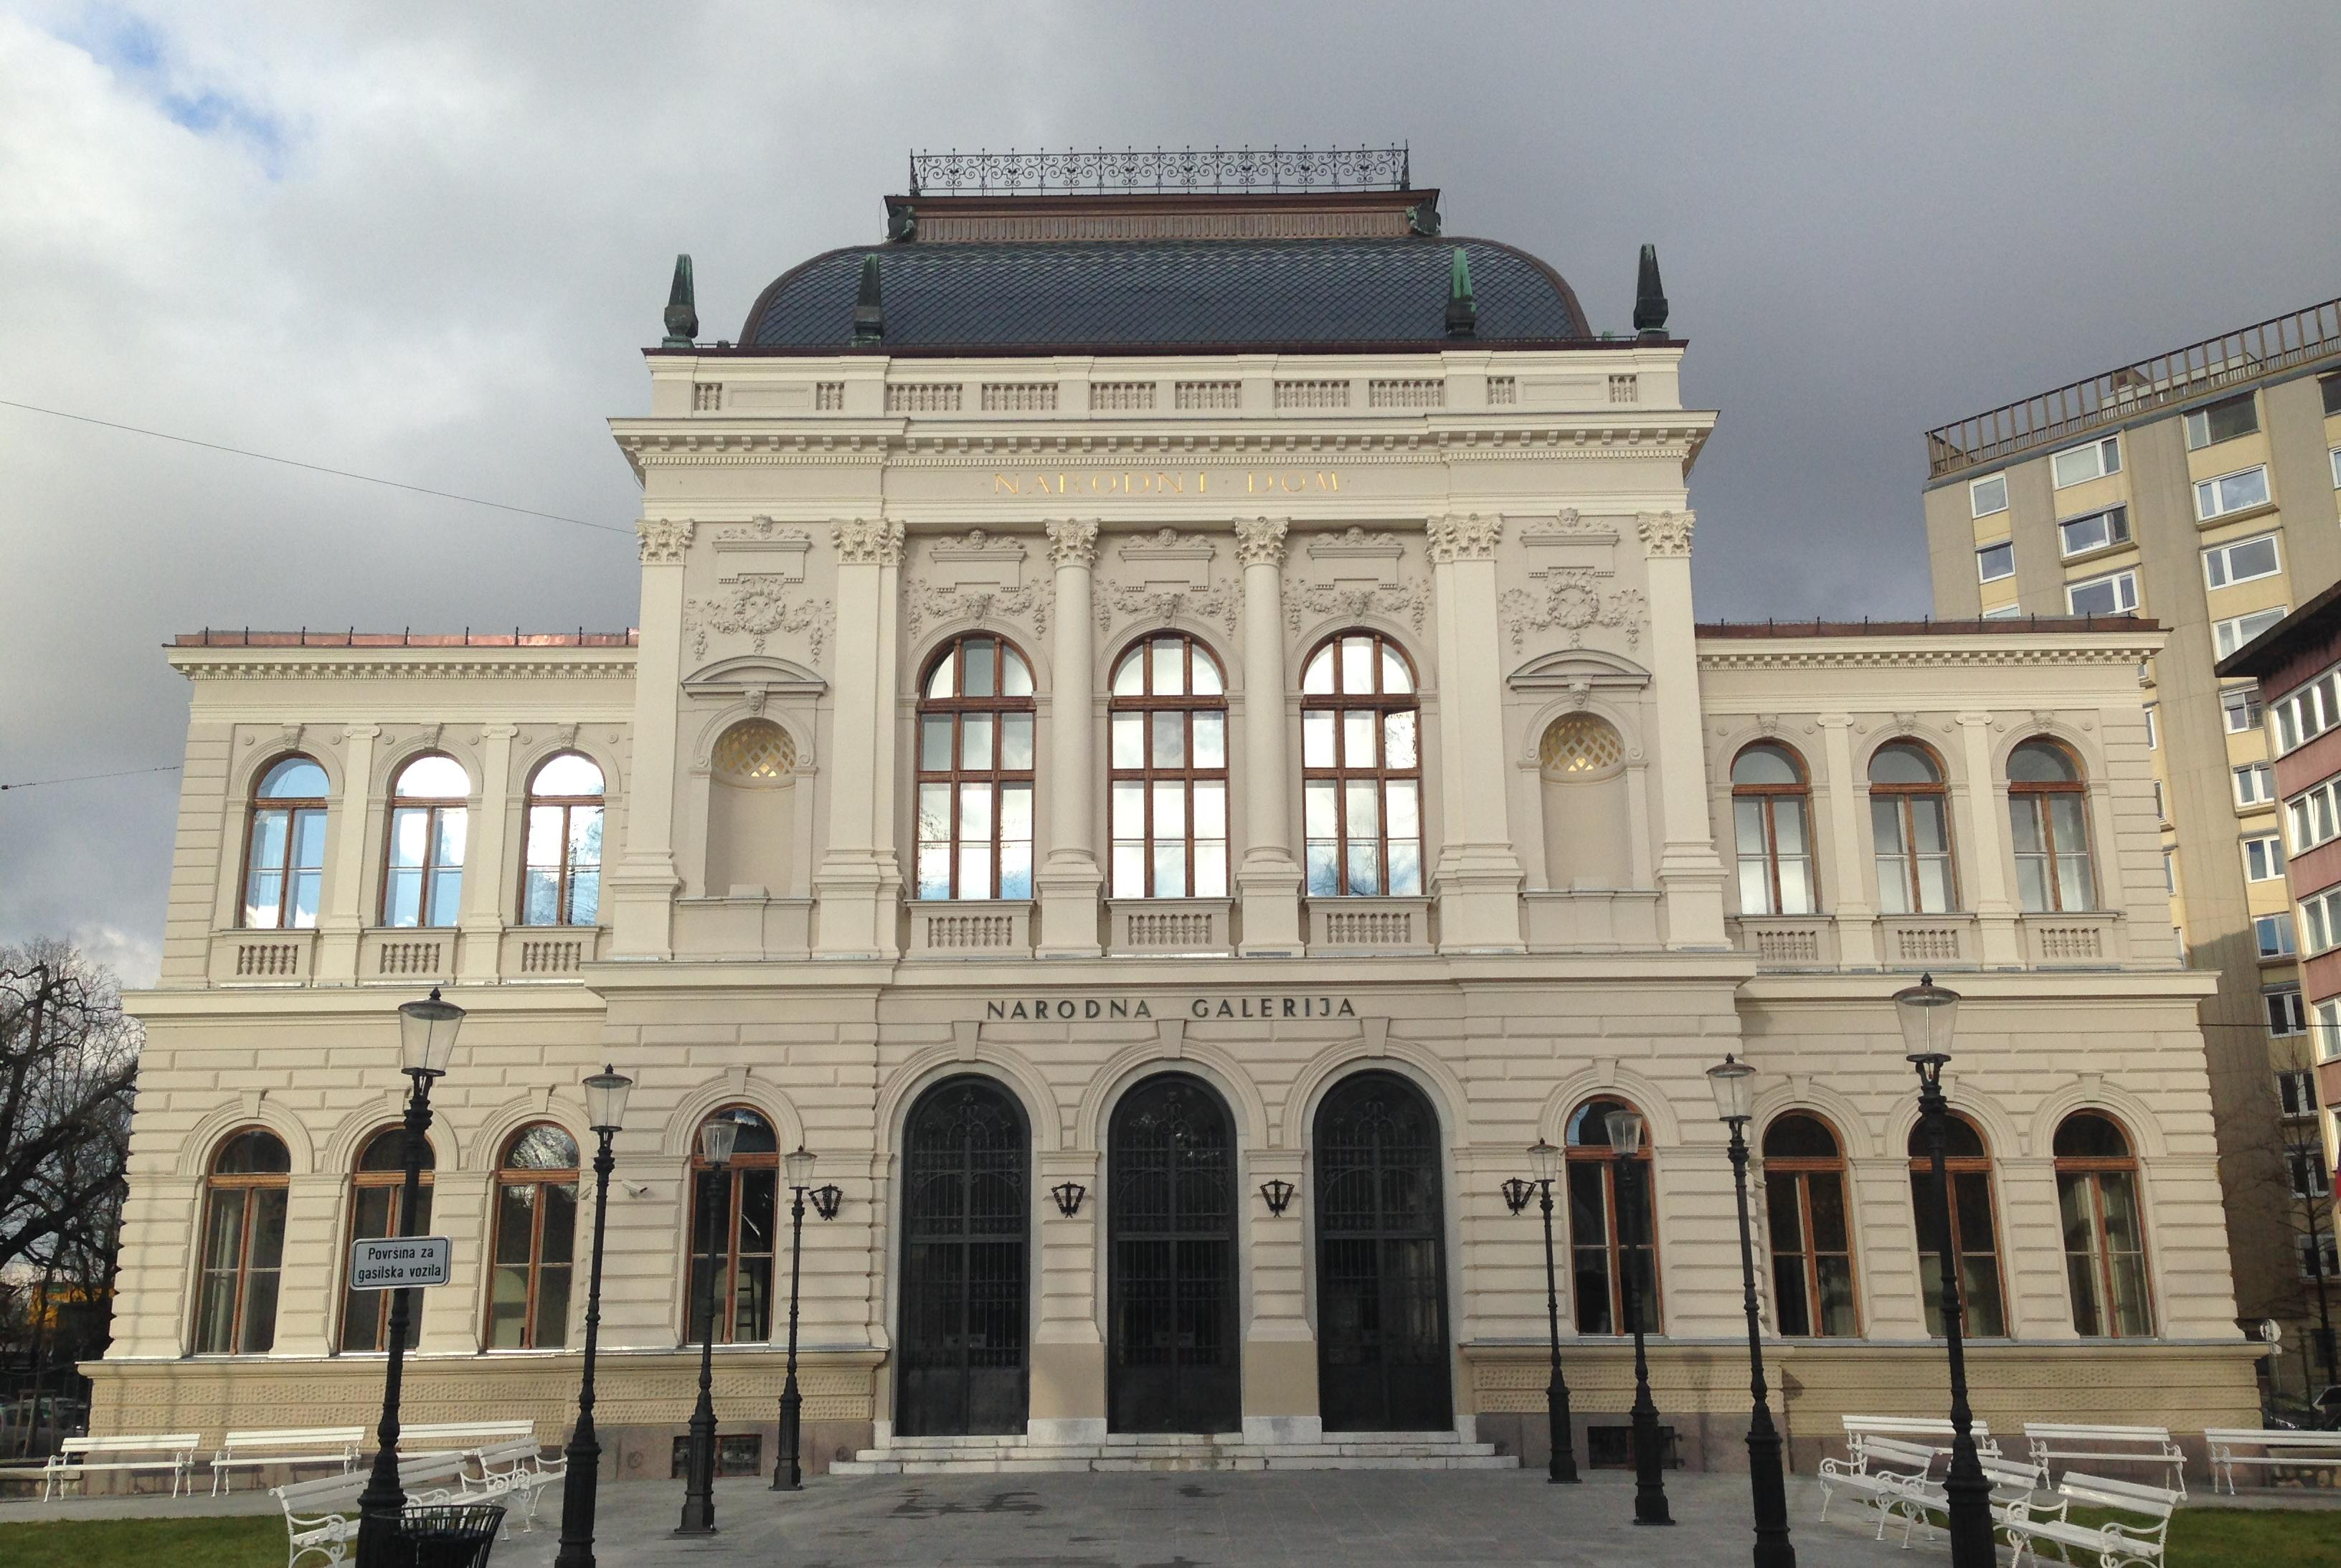 Ljubljana, the National Gallery